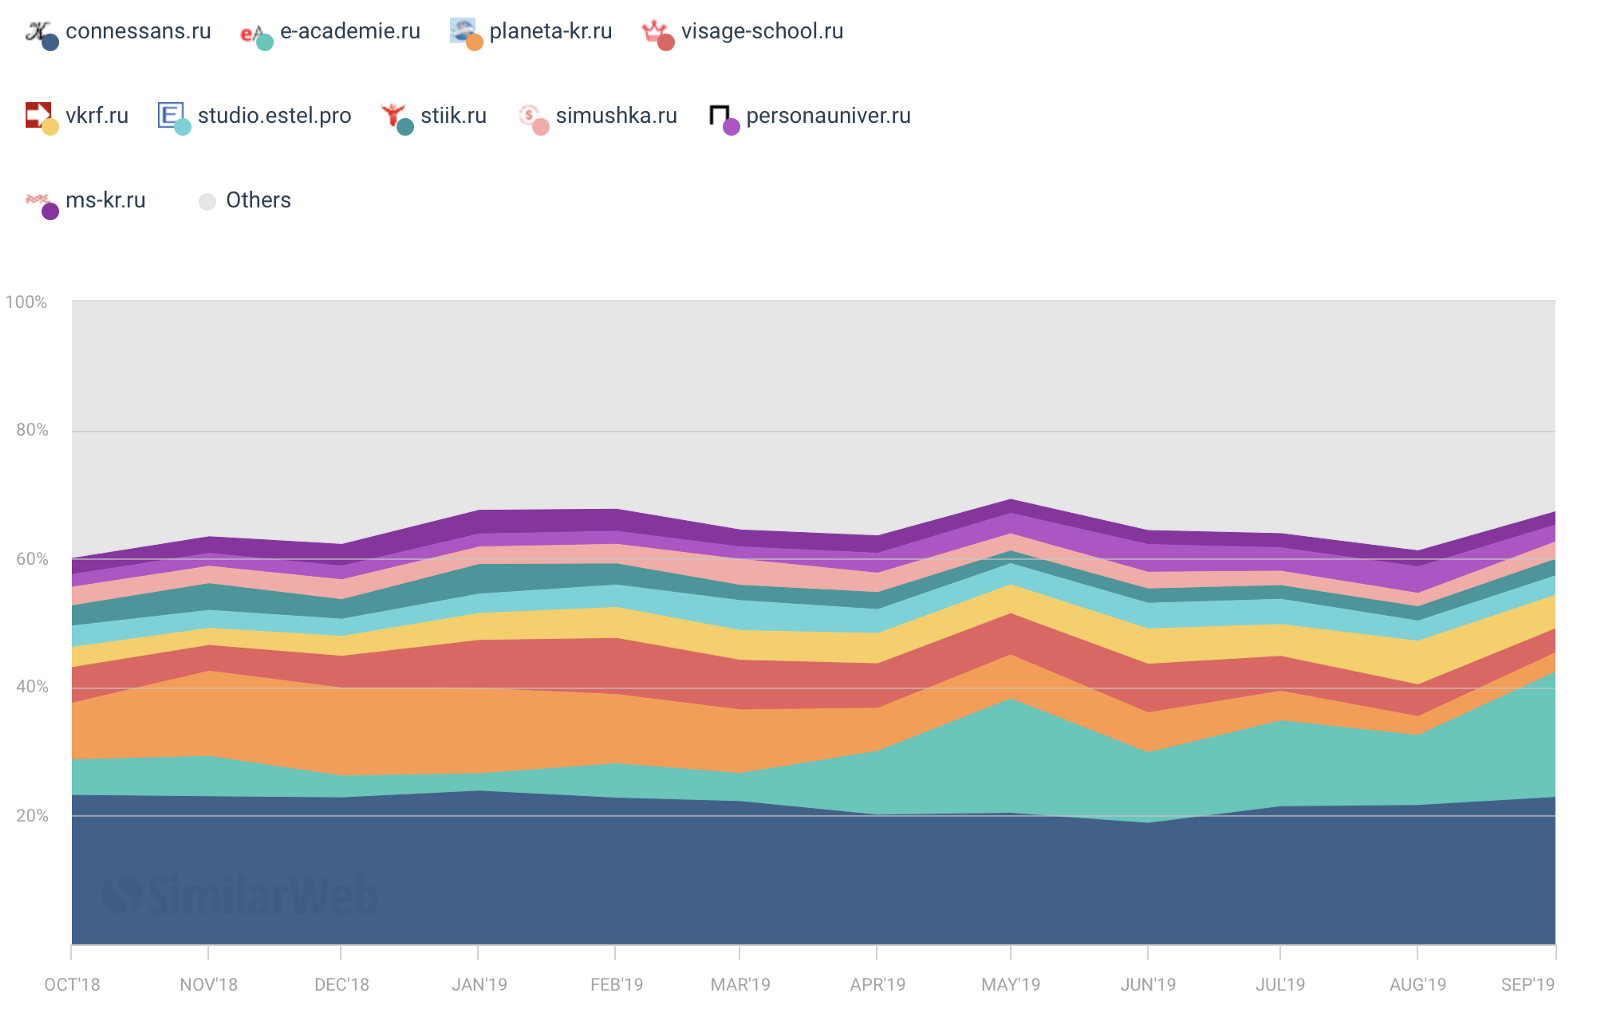 динамика доли трафика топ 100 сайтов